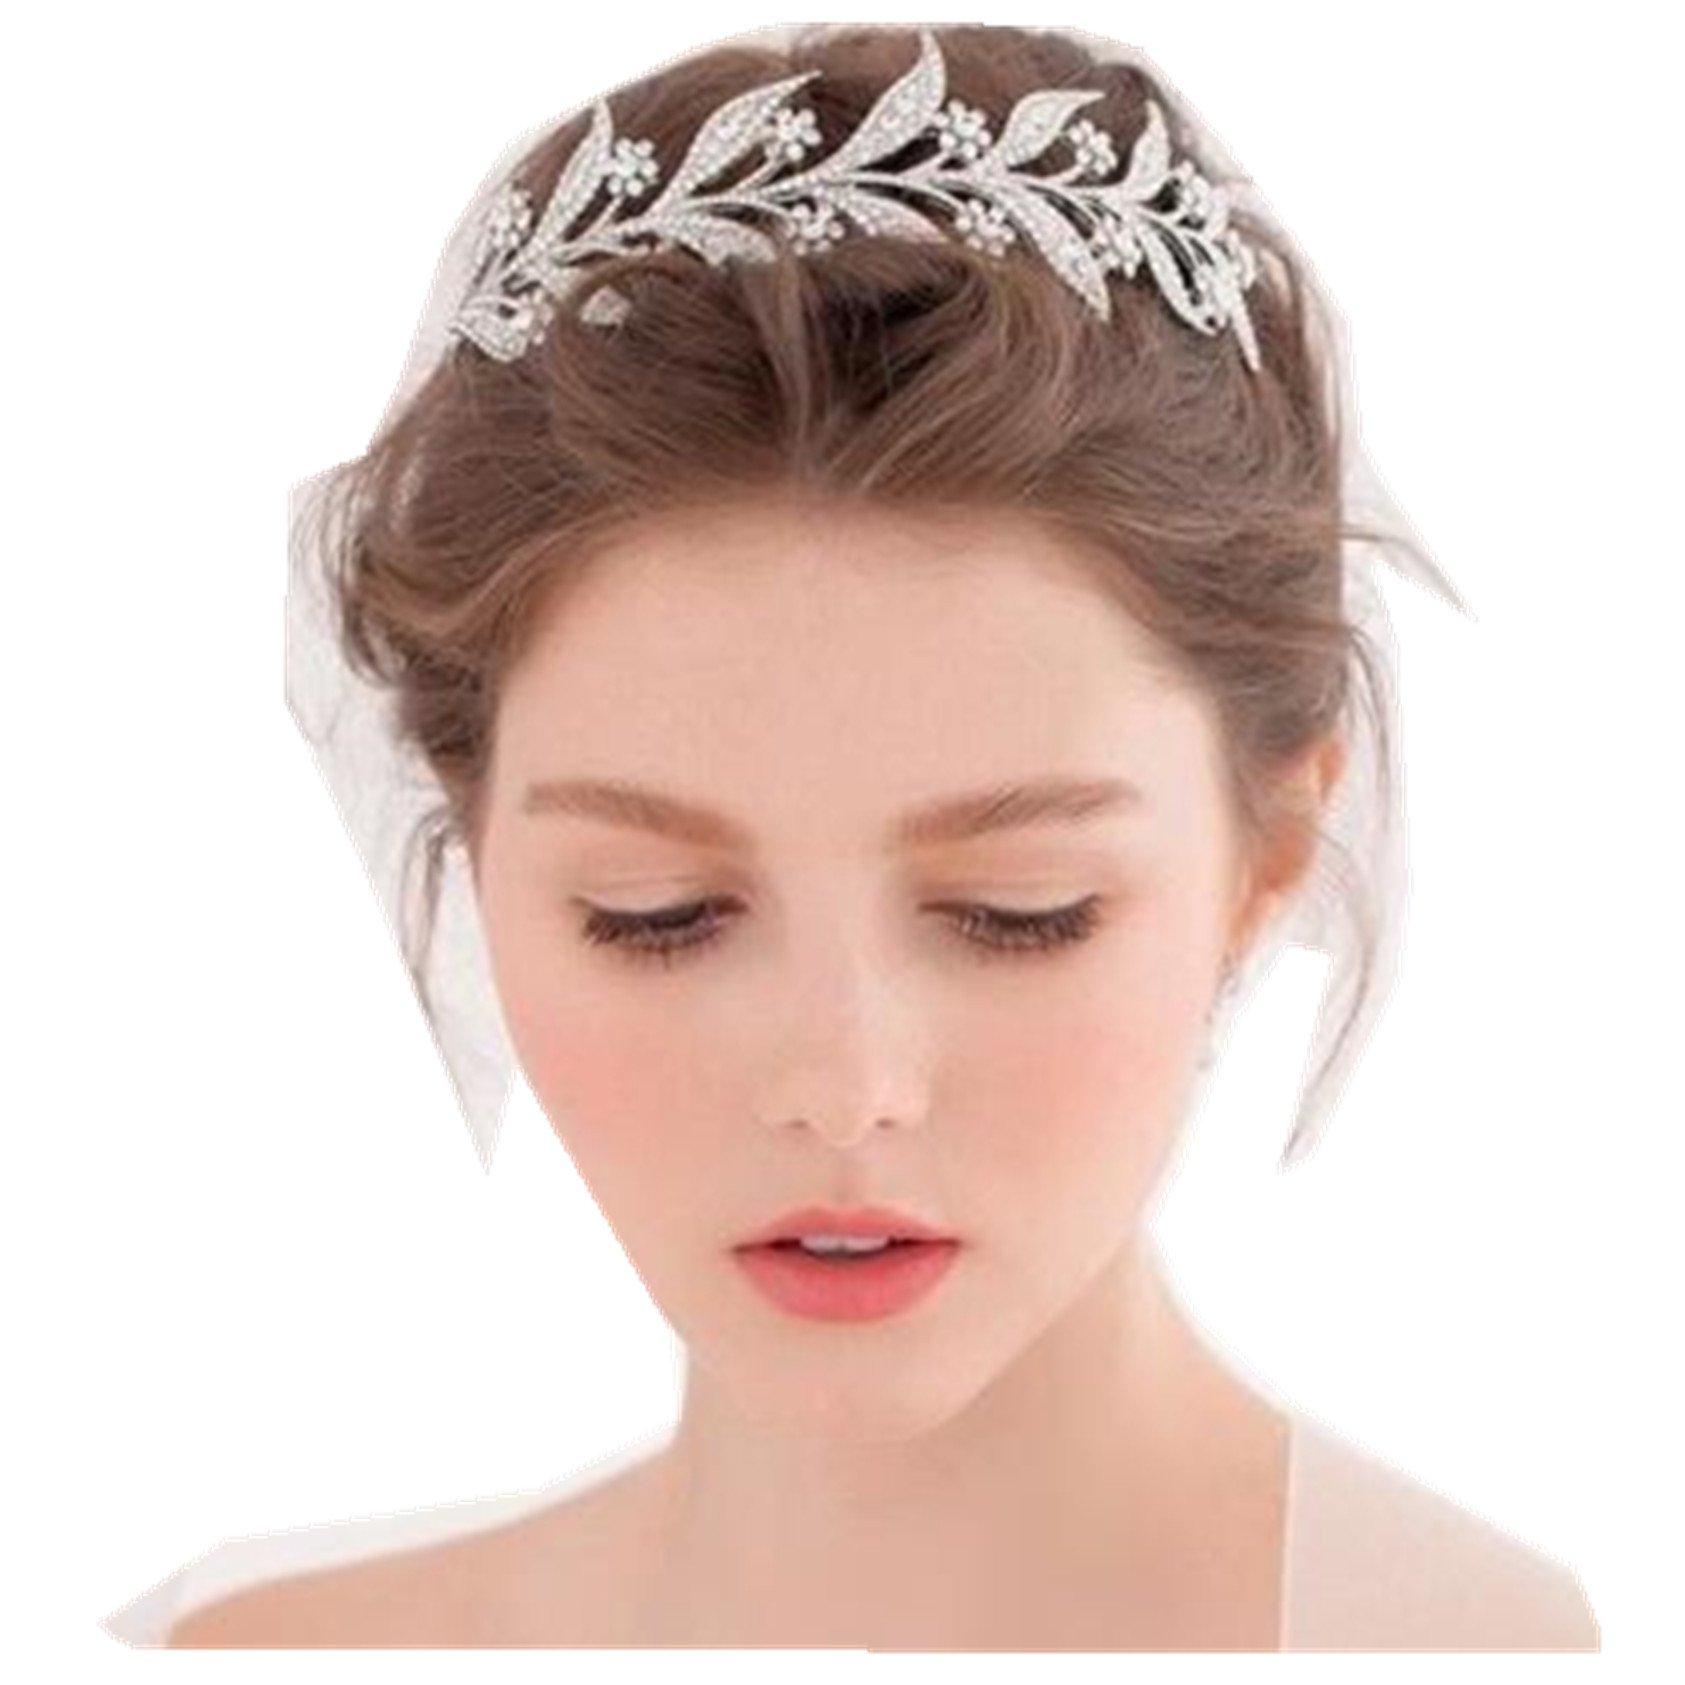 Bridal leave silver tone rhinestone party crown headpiece Hair tiara Leaves Crowns(#52)